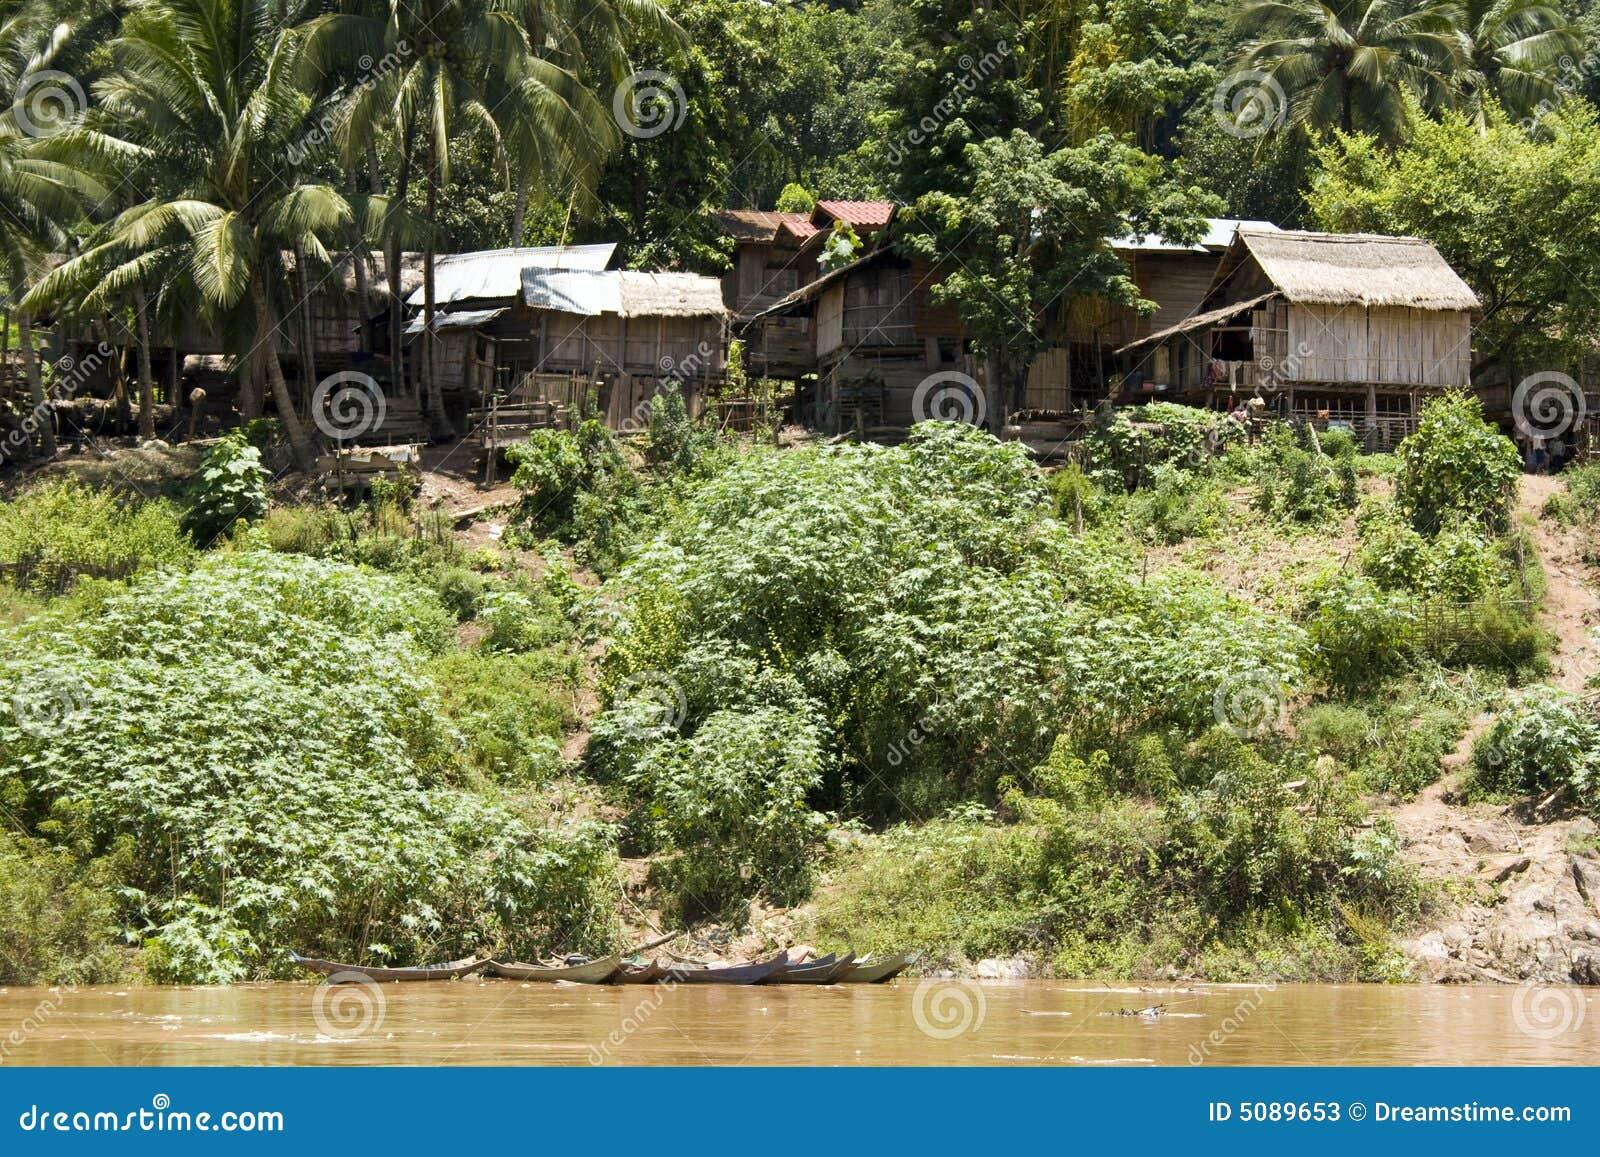 Village on Mekong River, Laos